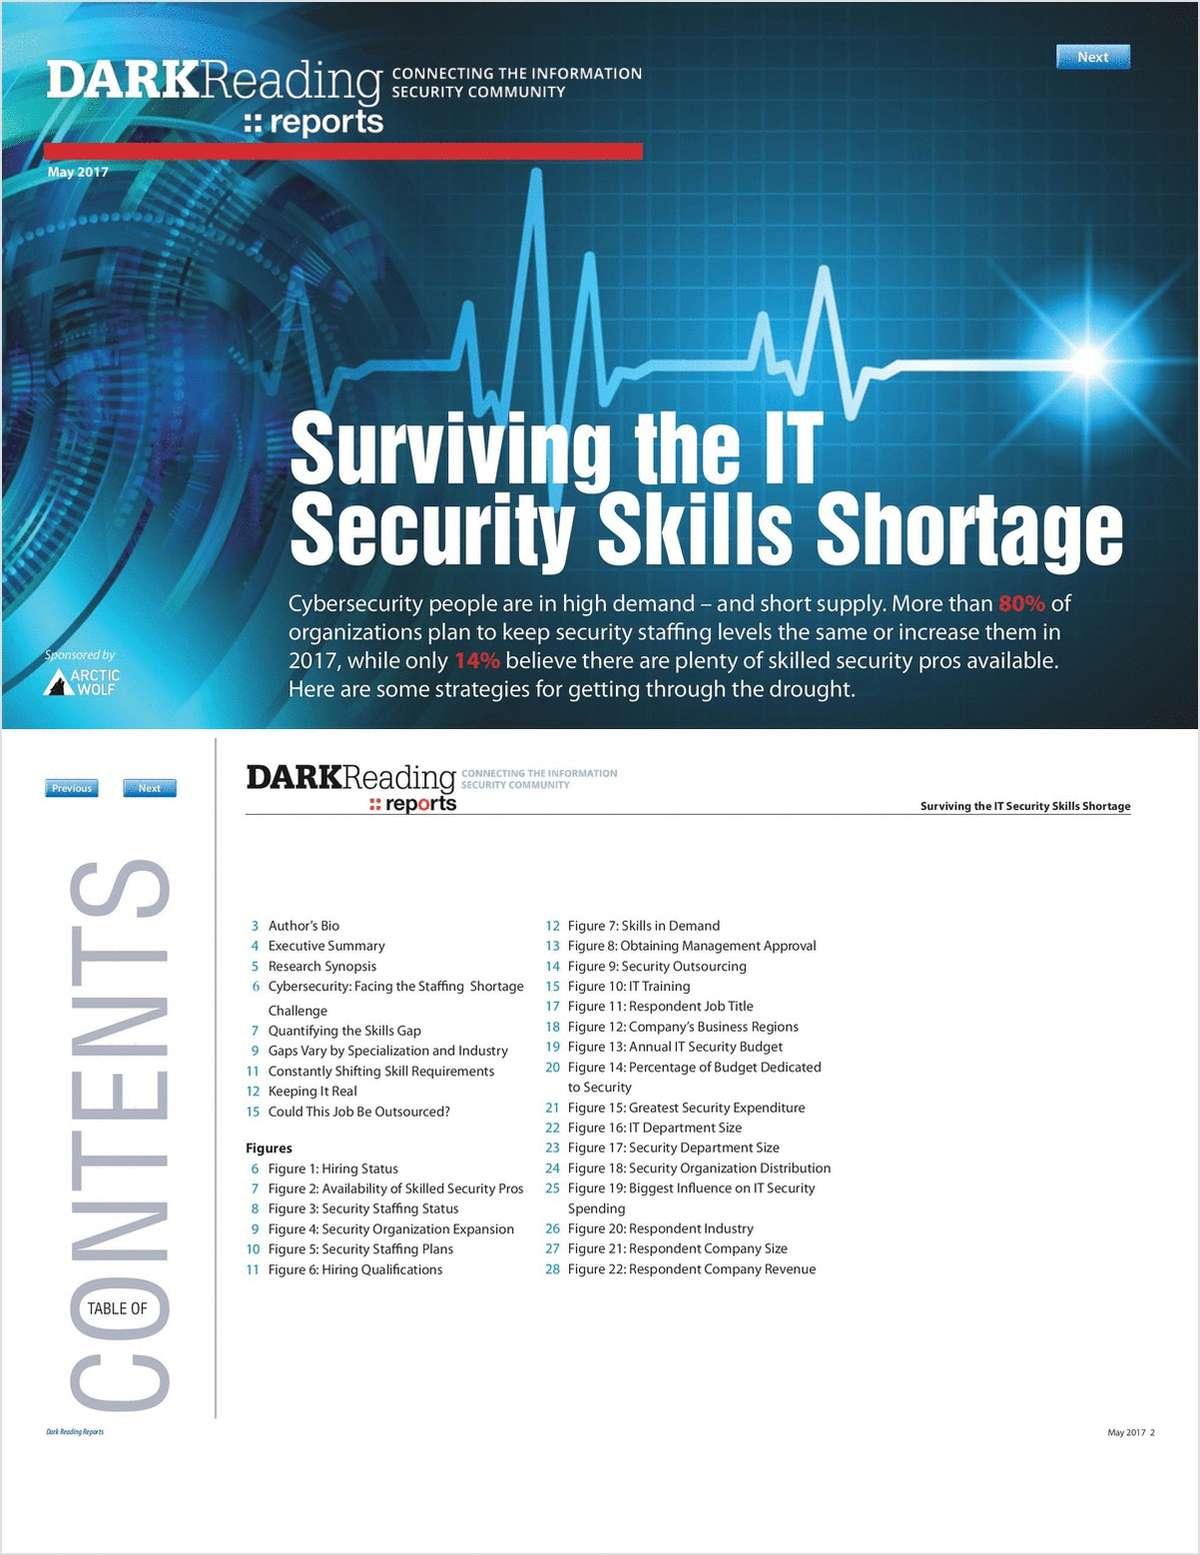 Dark Reading Report: Surviving the IT Security Skills Shortage